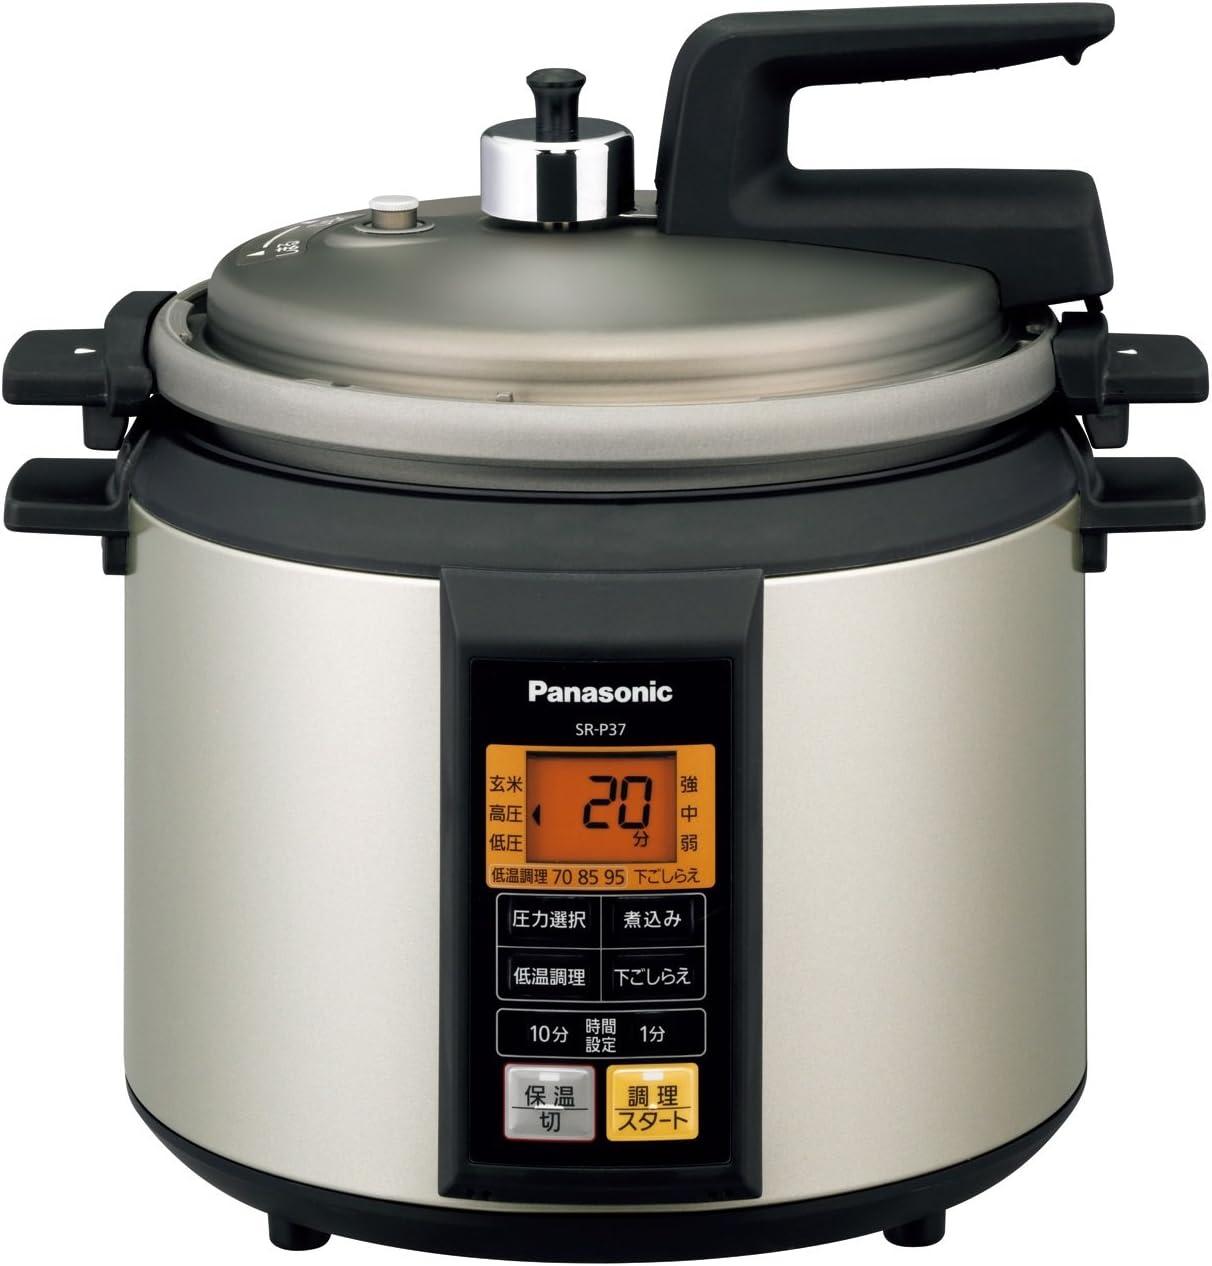 Panasonic microcomputer electric pressure cooker Noble champagne SR-P37-N